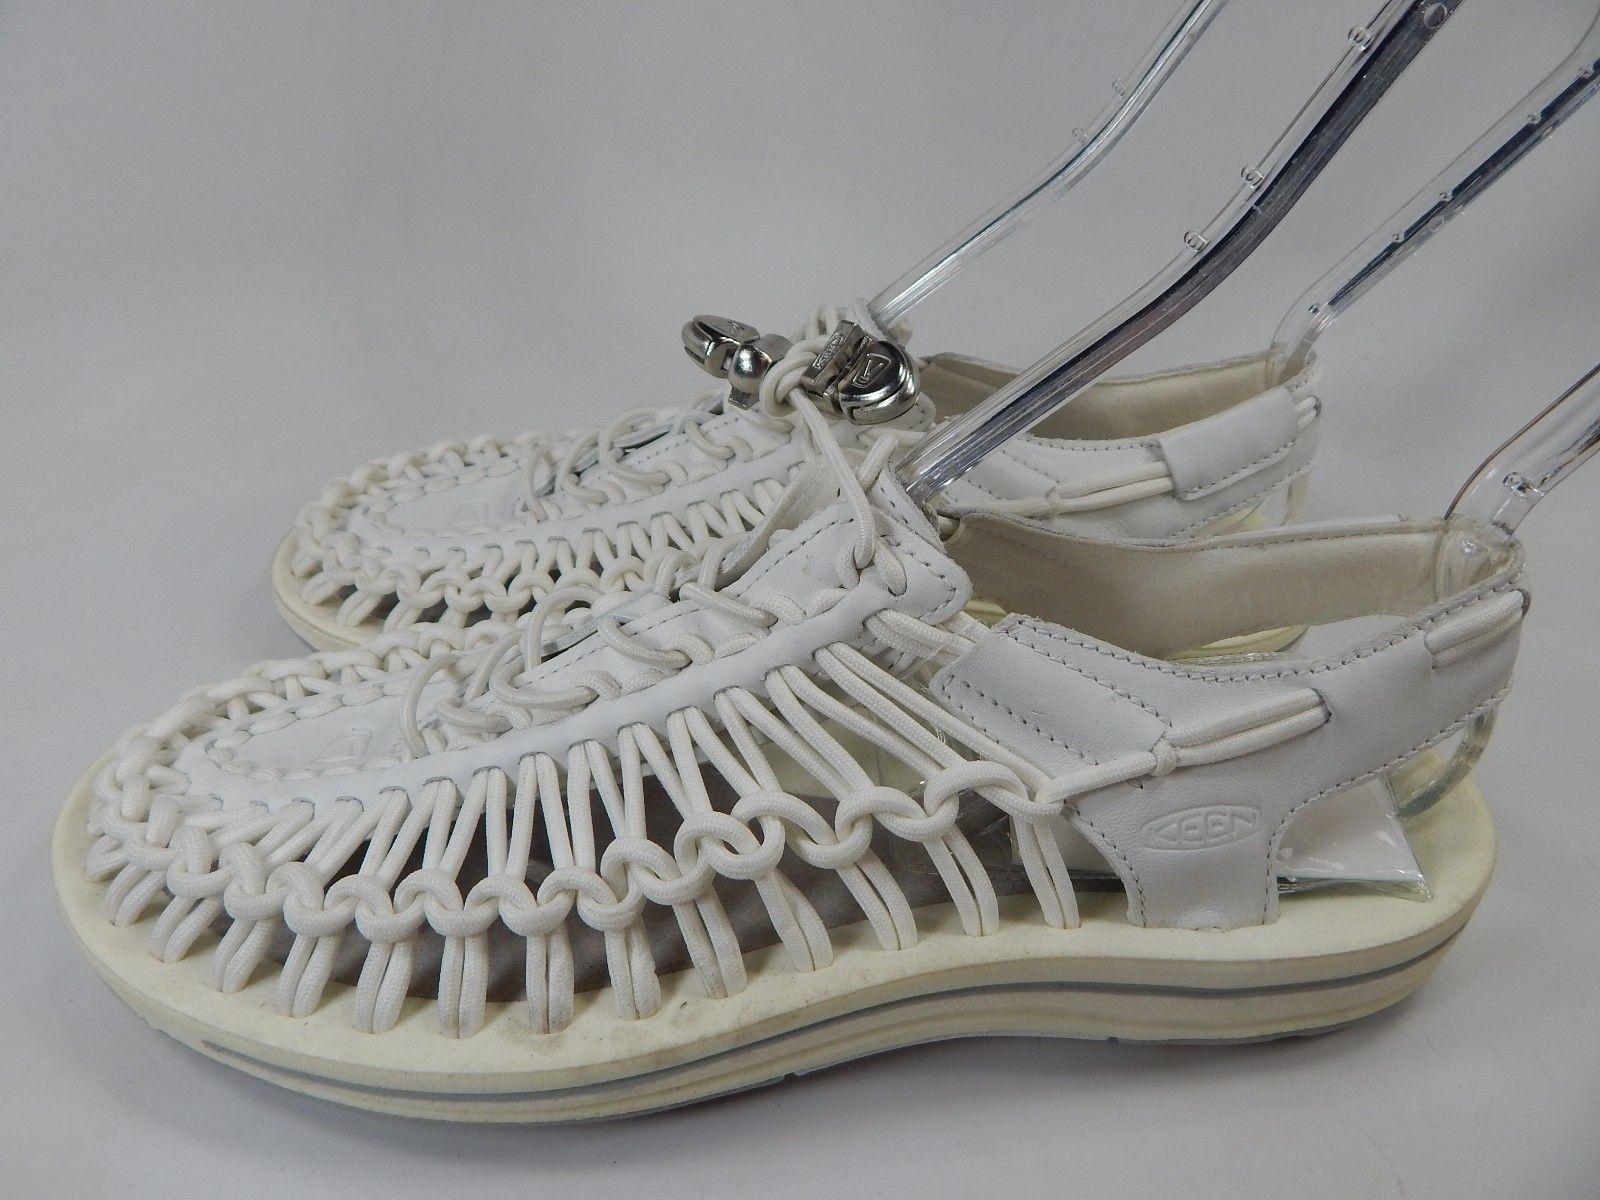 Keen Uneek Leather Sandals Men's Size US 9 M (D) EU 42 White/ Star White $110